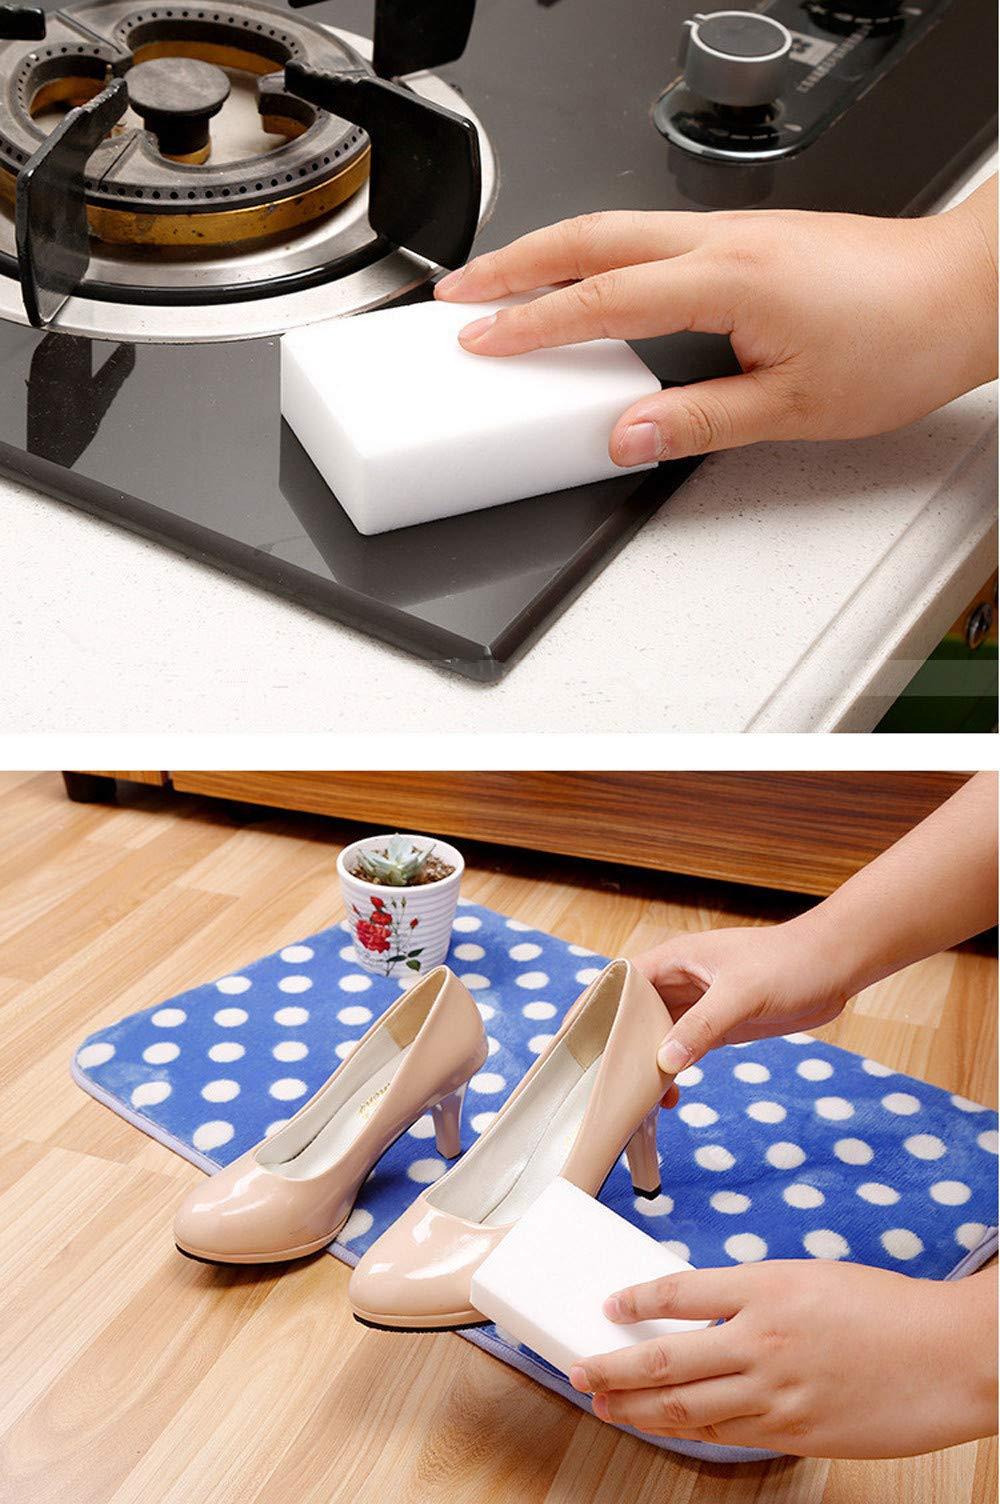 KNDDYY Magic Cleaning Sponge Magic Eraser Sponges Foam Cleaning Pad - Eraser Sponge for All Surface (40PC)